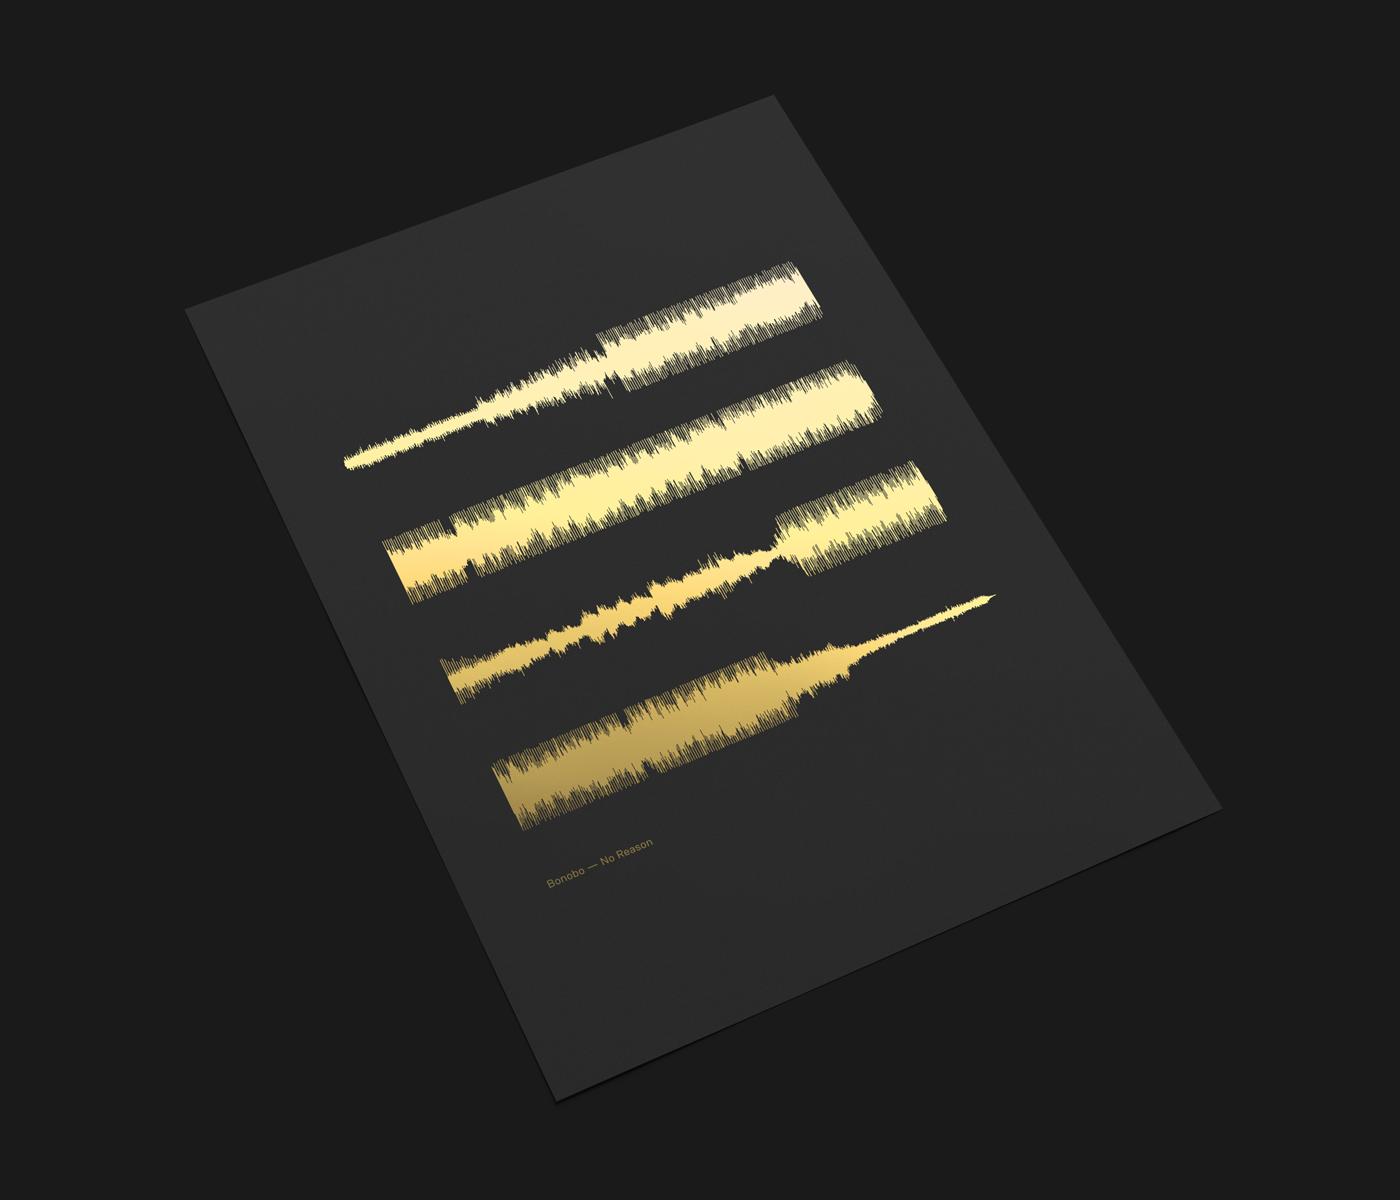 waveform poster music design Audio foiling graphic design  art direction  ILLUSTRATION  songs